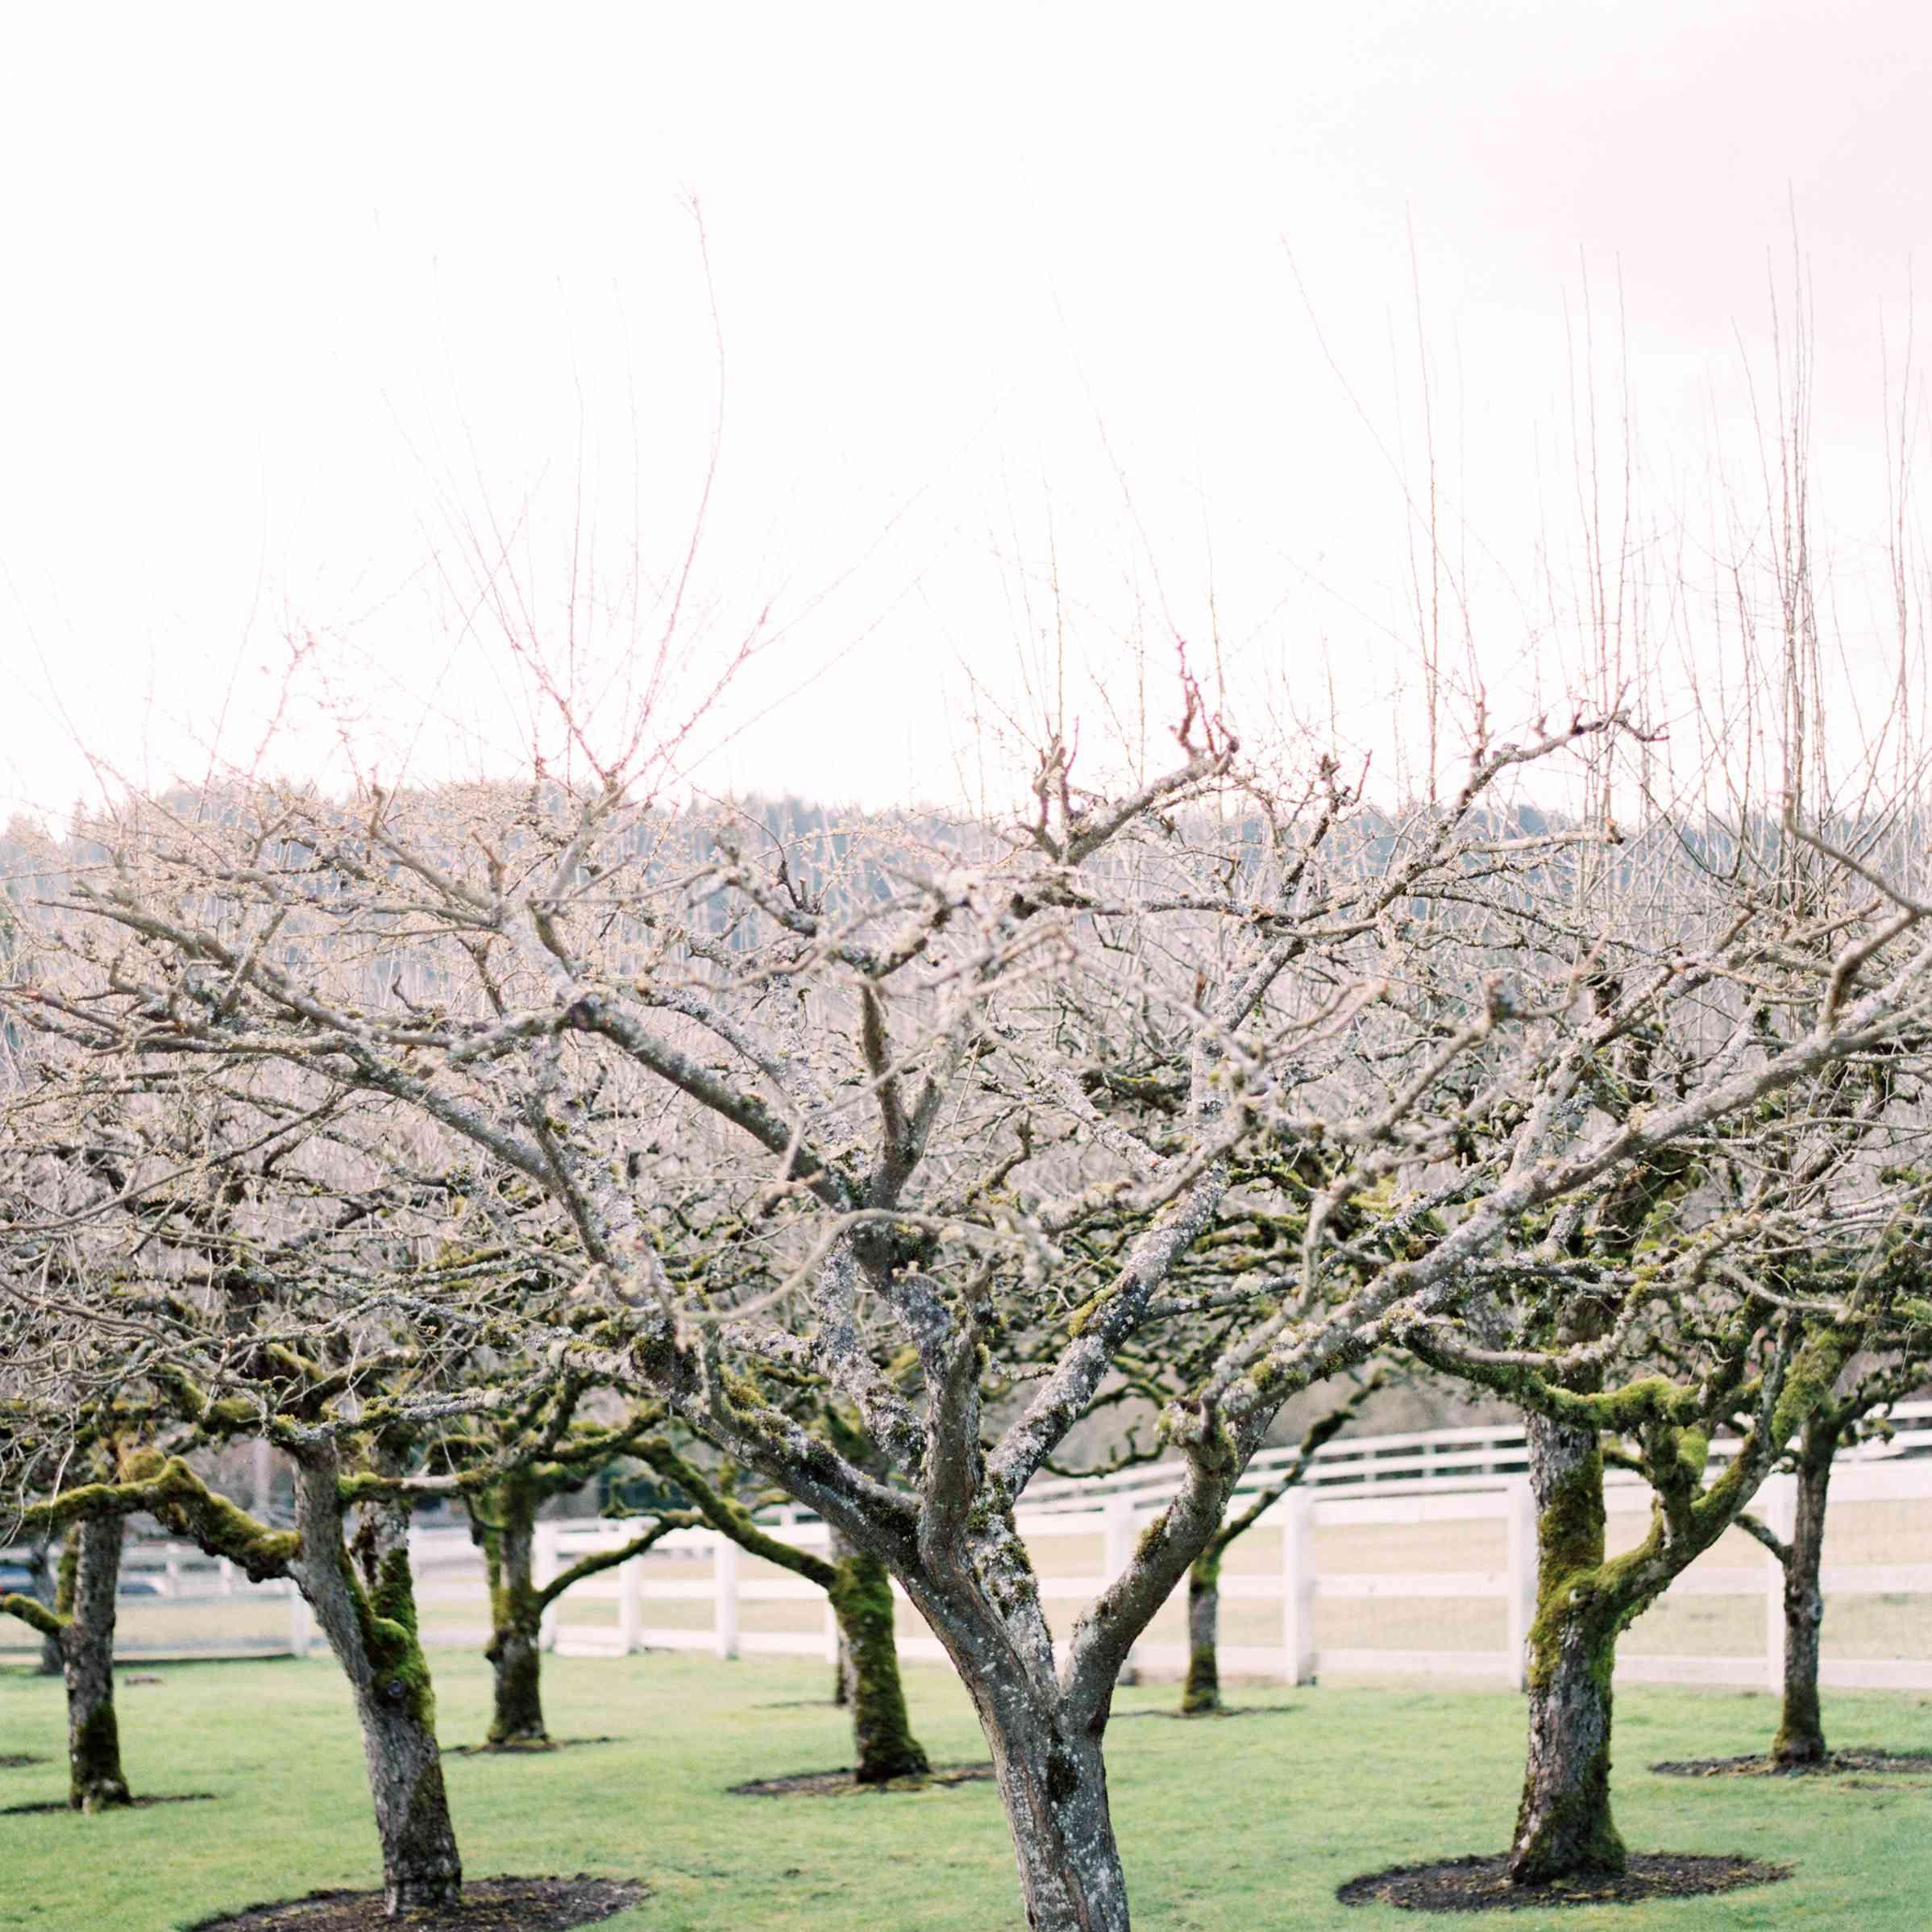 <p>Weathered trees amongst a lush landscape.</p>